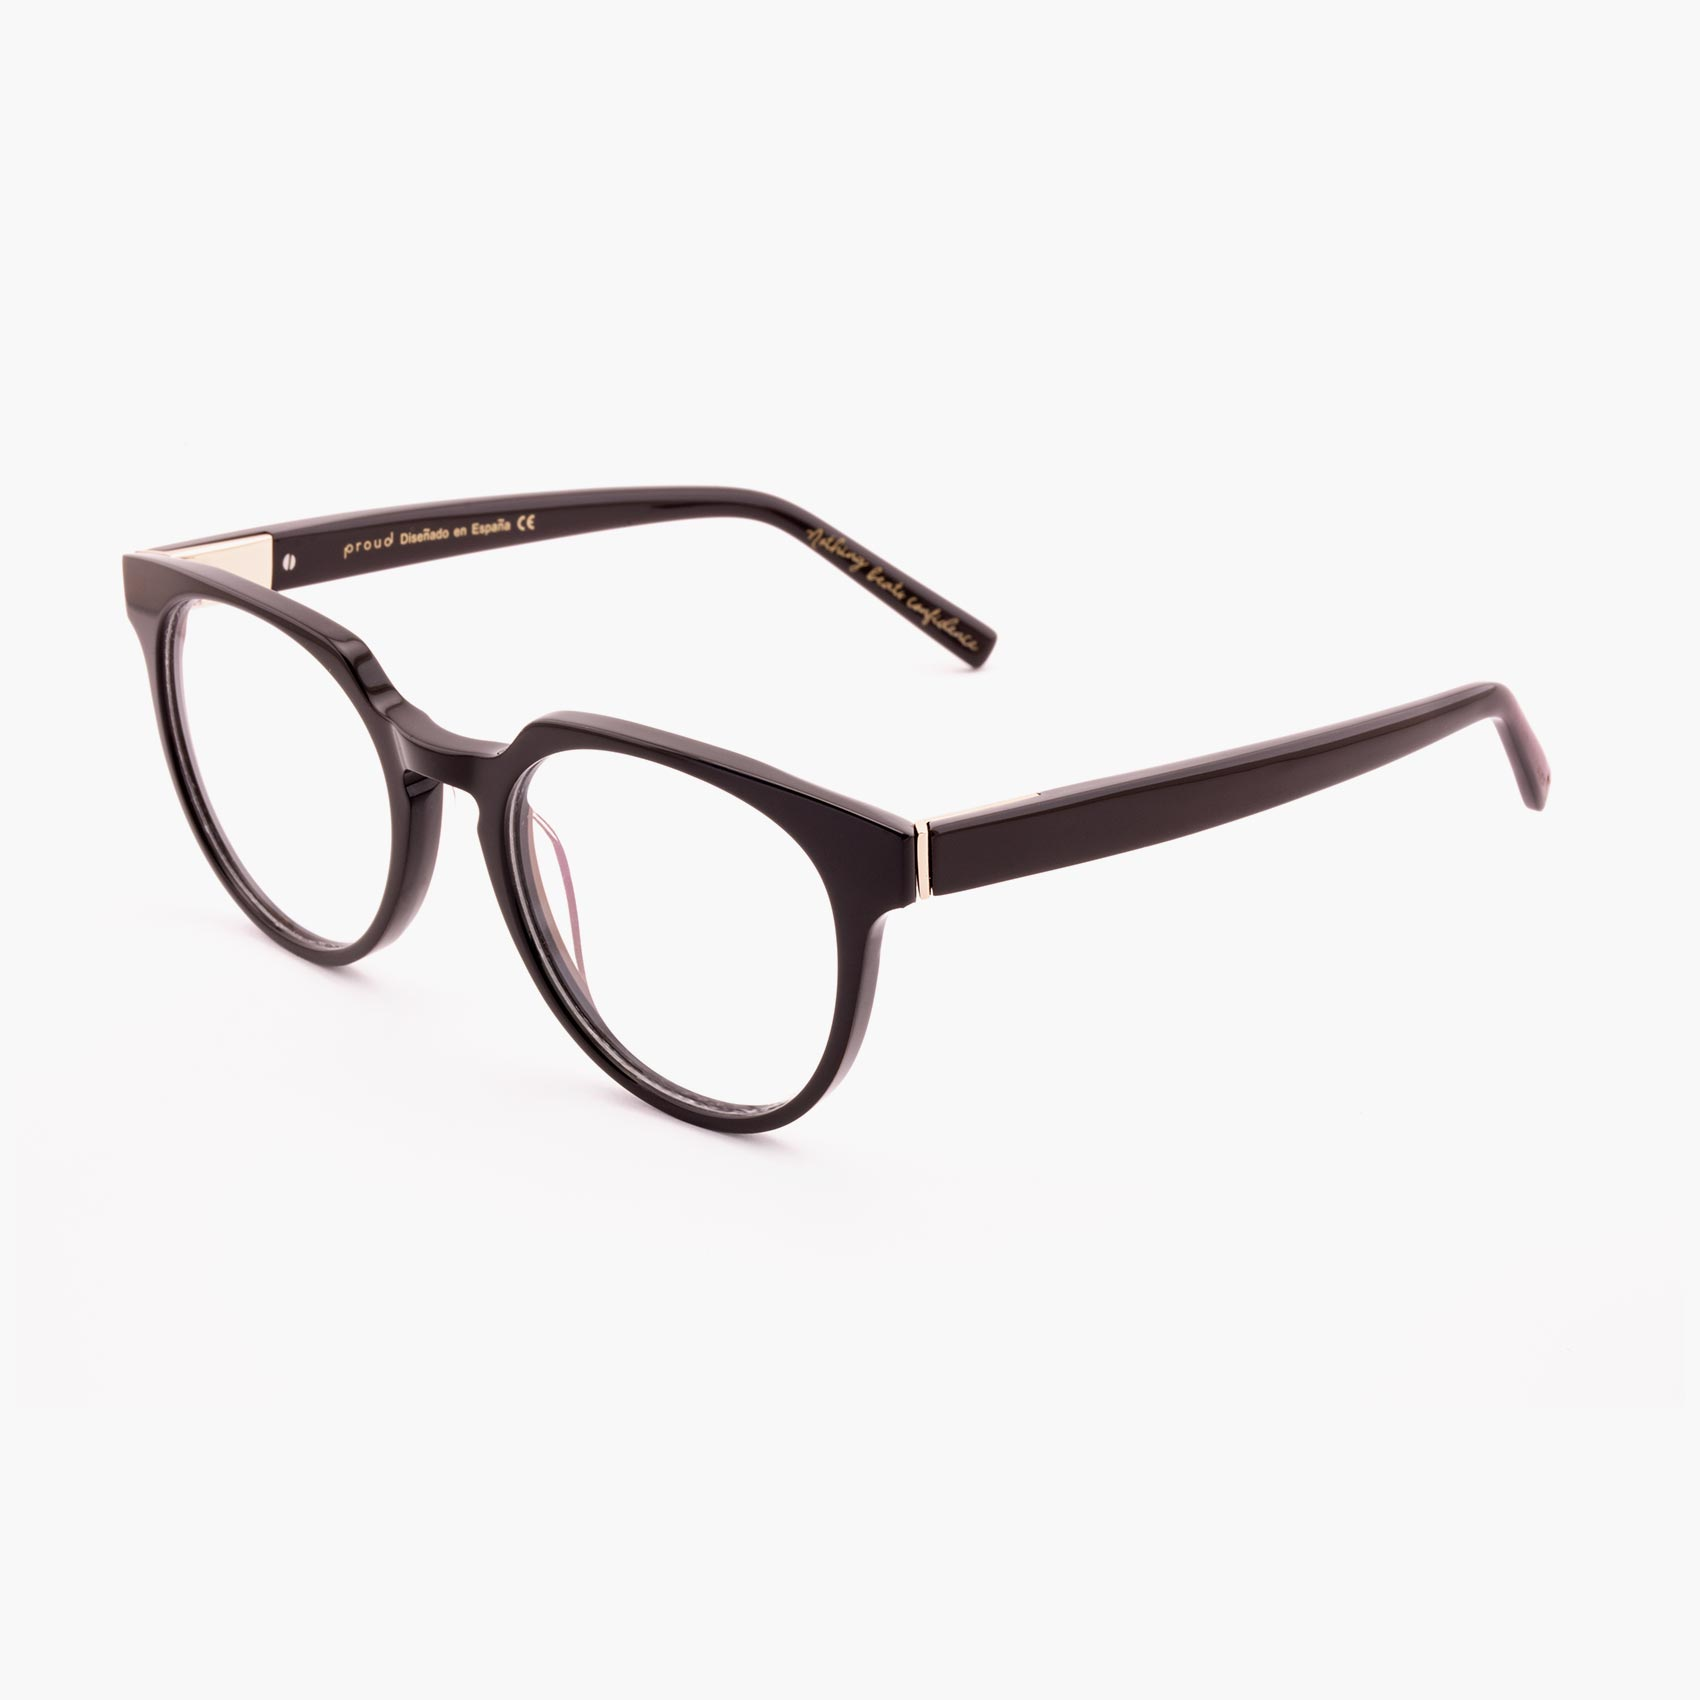 Proud eyewear Benigni C2 P tendencia gafas graduadas marrón oscuro